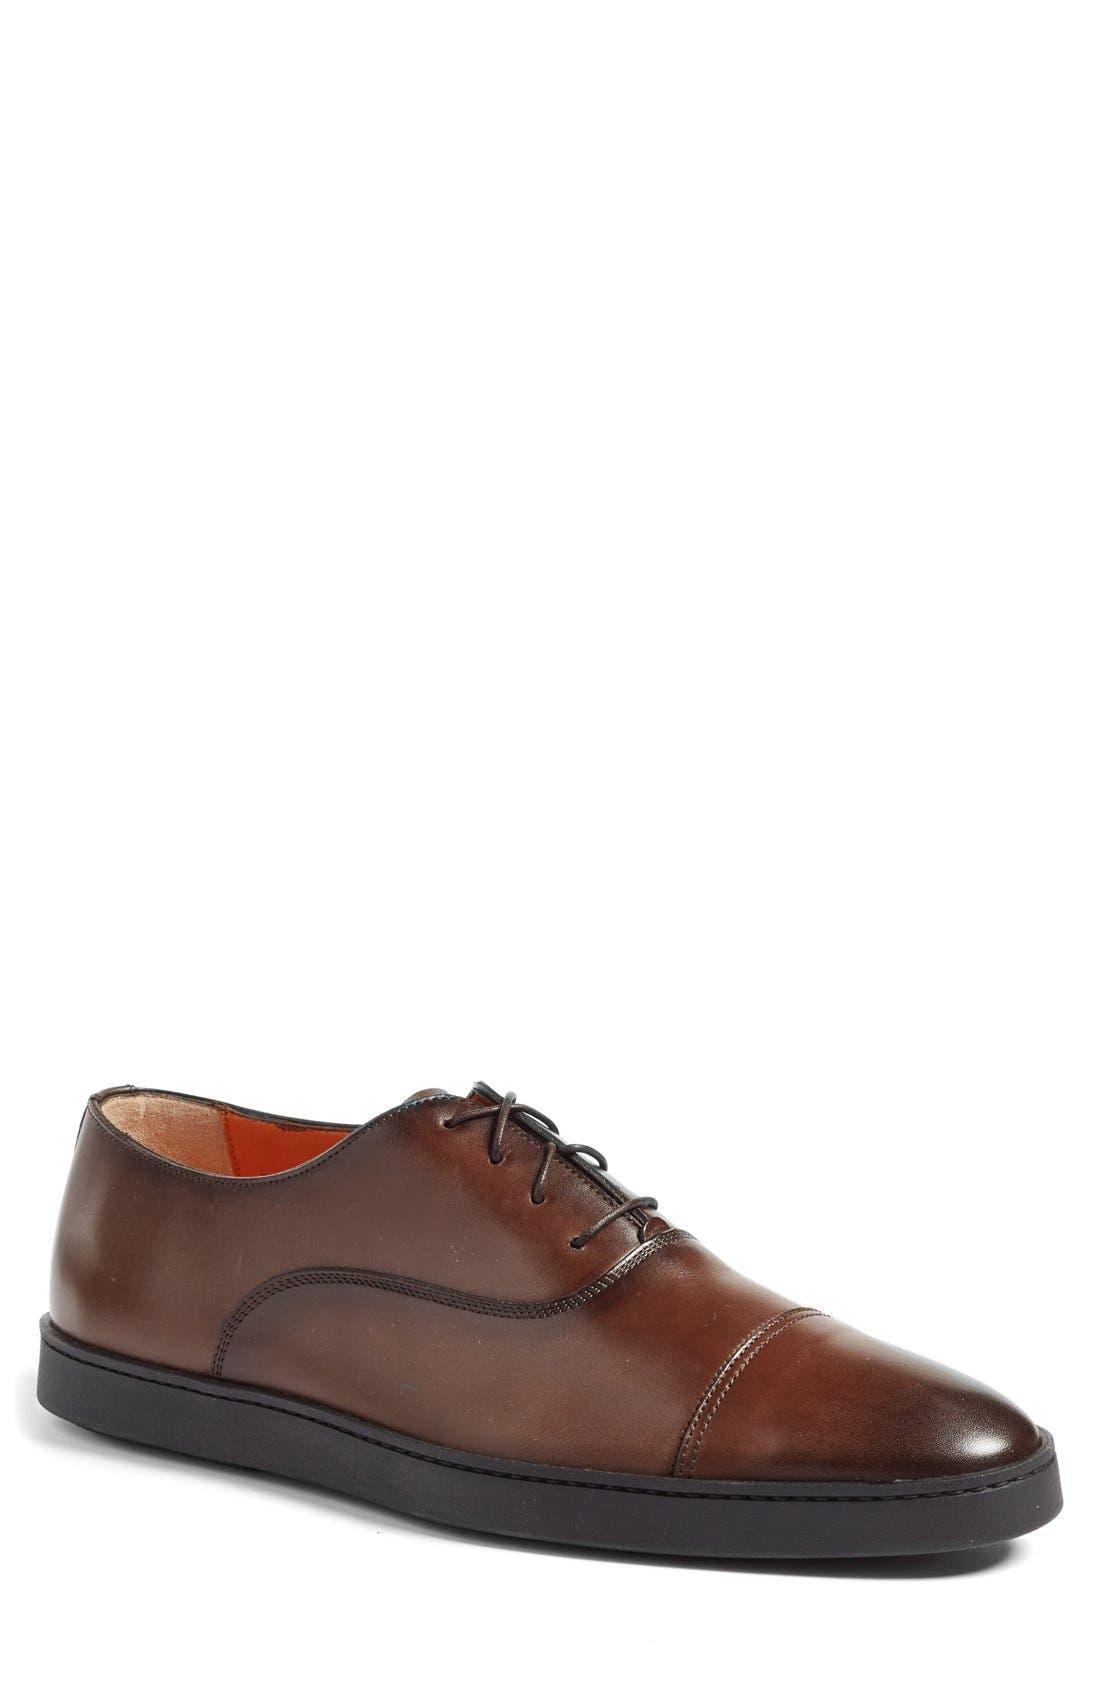 Main Image - Santoni 'Durbin' Oxford Sneaker (Men)